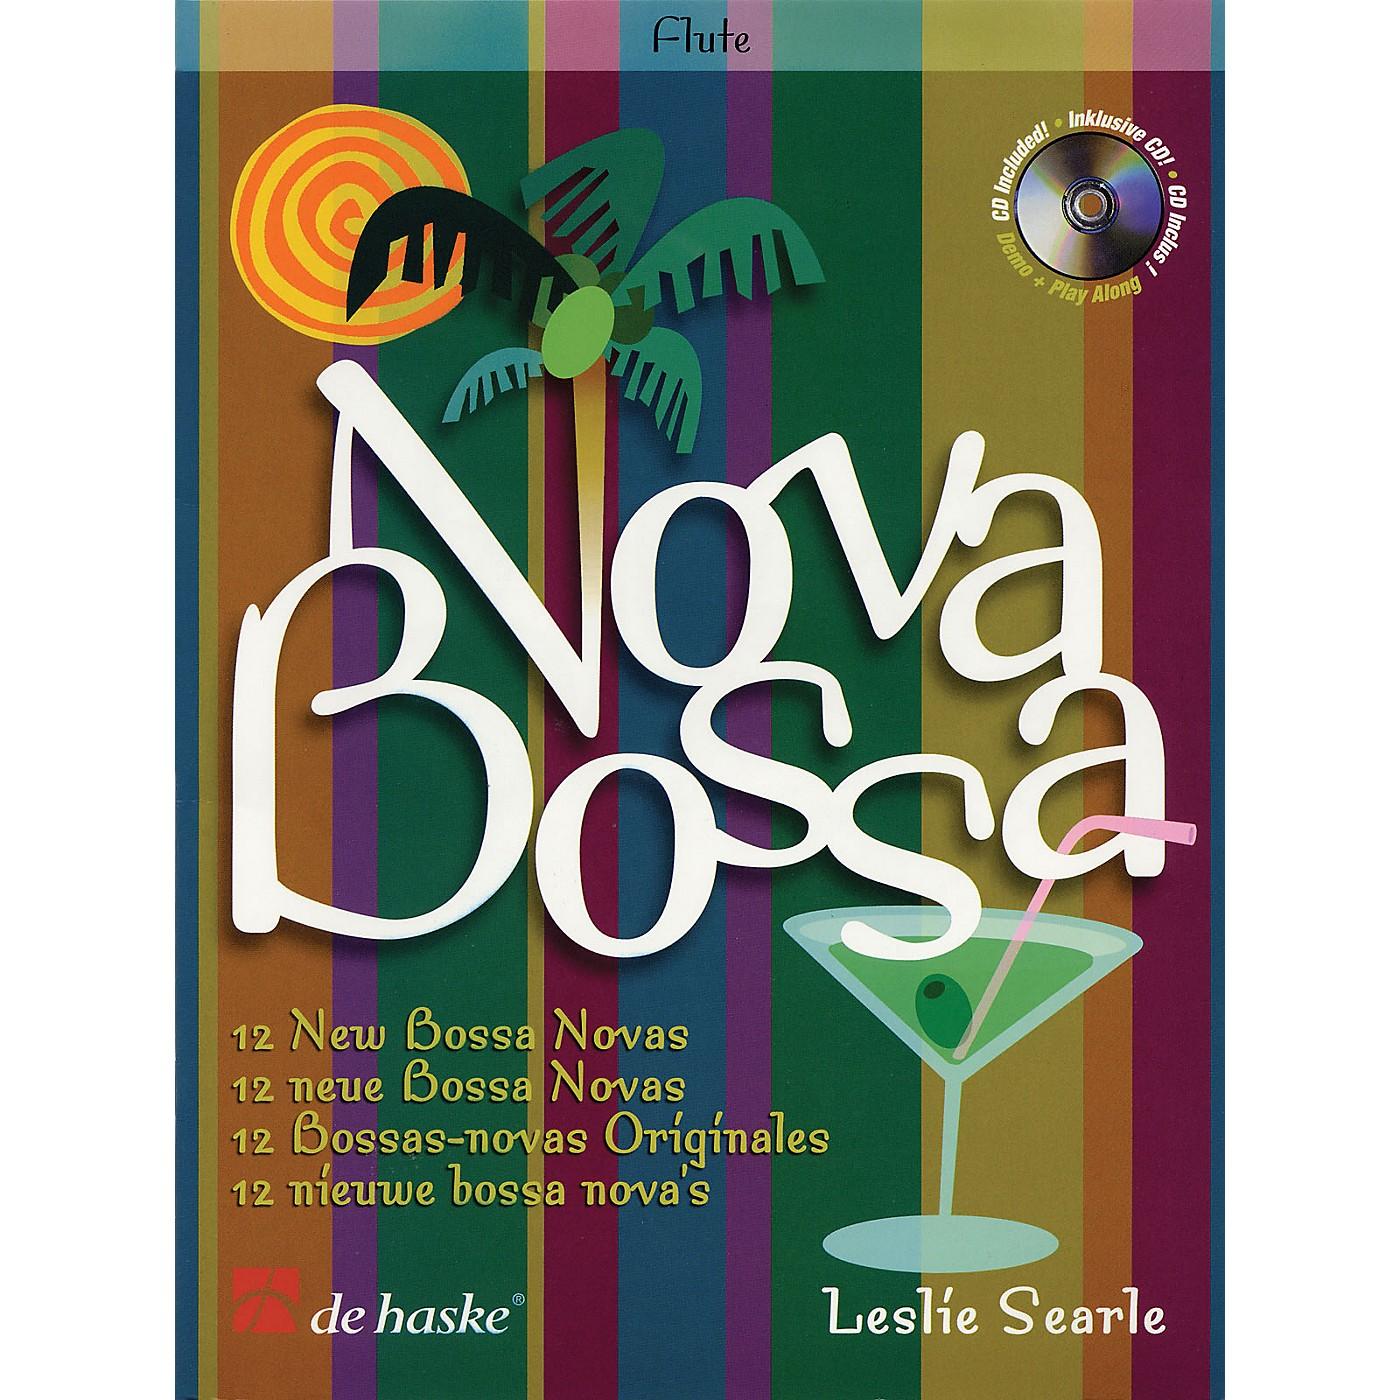 De Haske Music Nova Bossa (12 New Bossa Novas - Clarinet) De Haske Play-Along Book Series Composed by Leslie Searle thumbnail